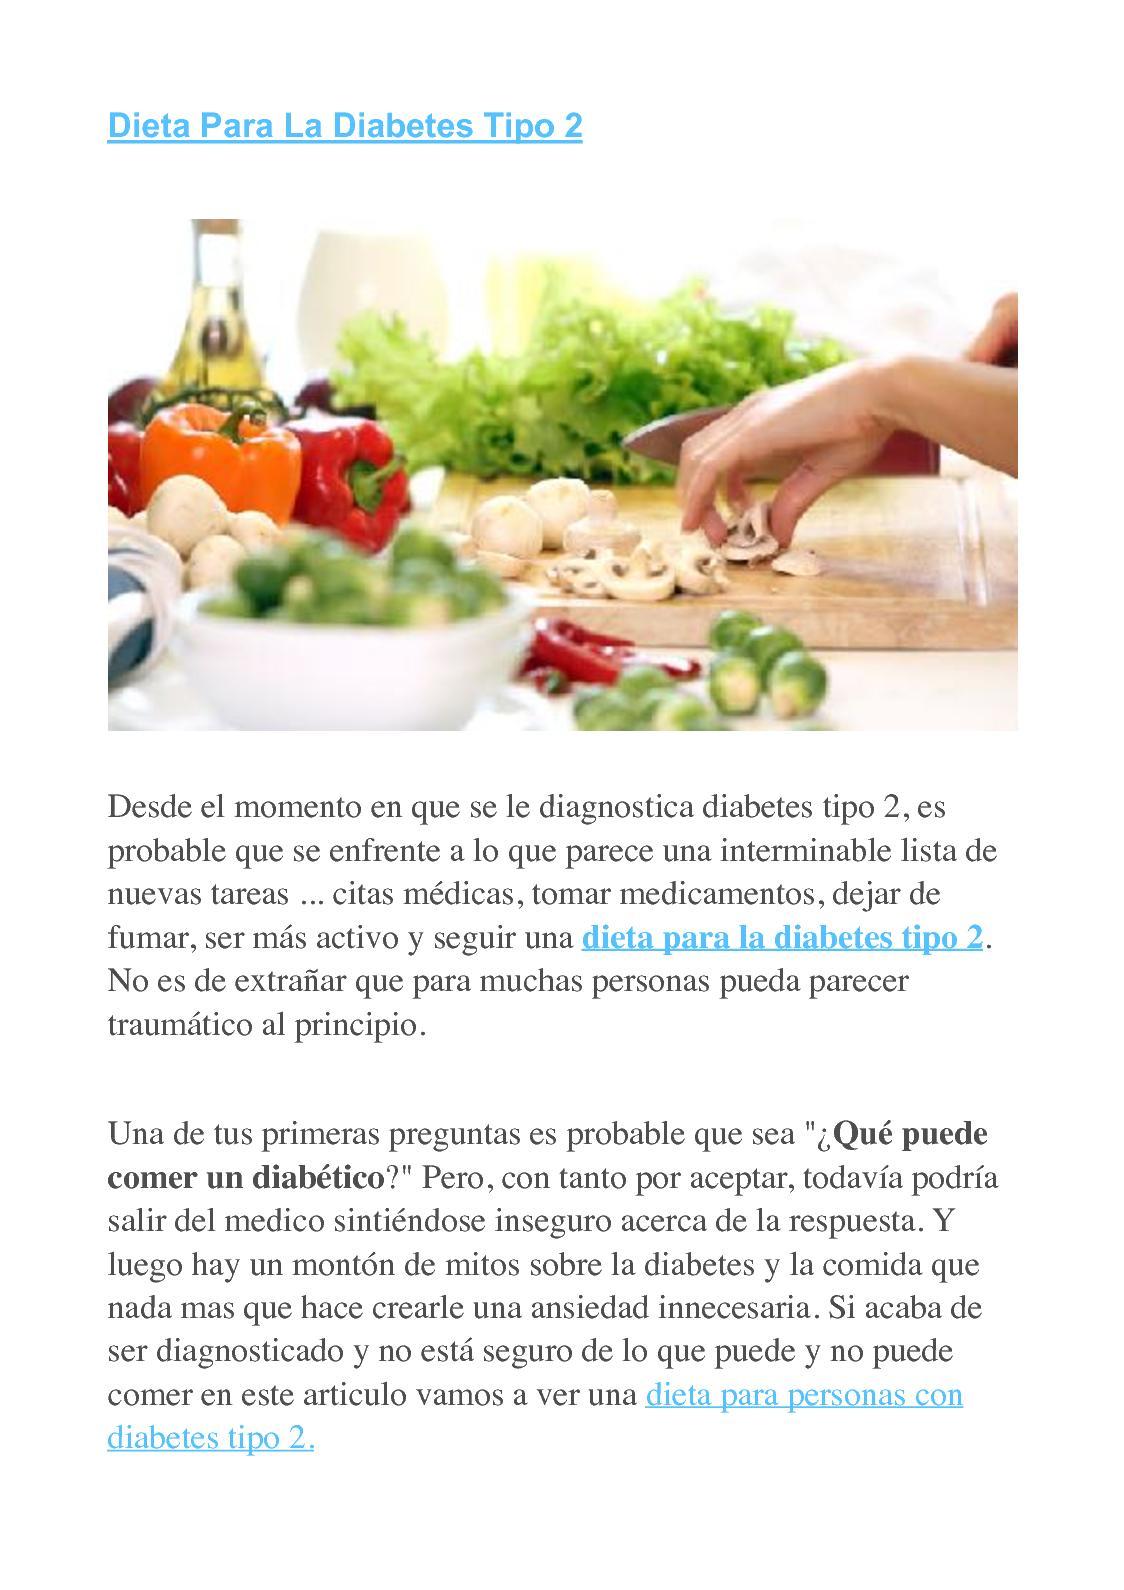 Dieta de un diabetes tipo 2